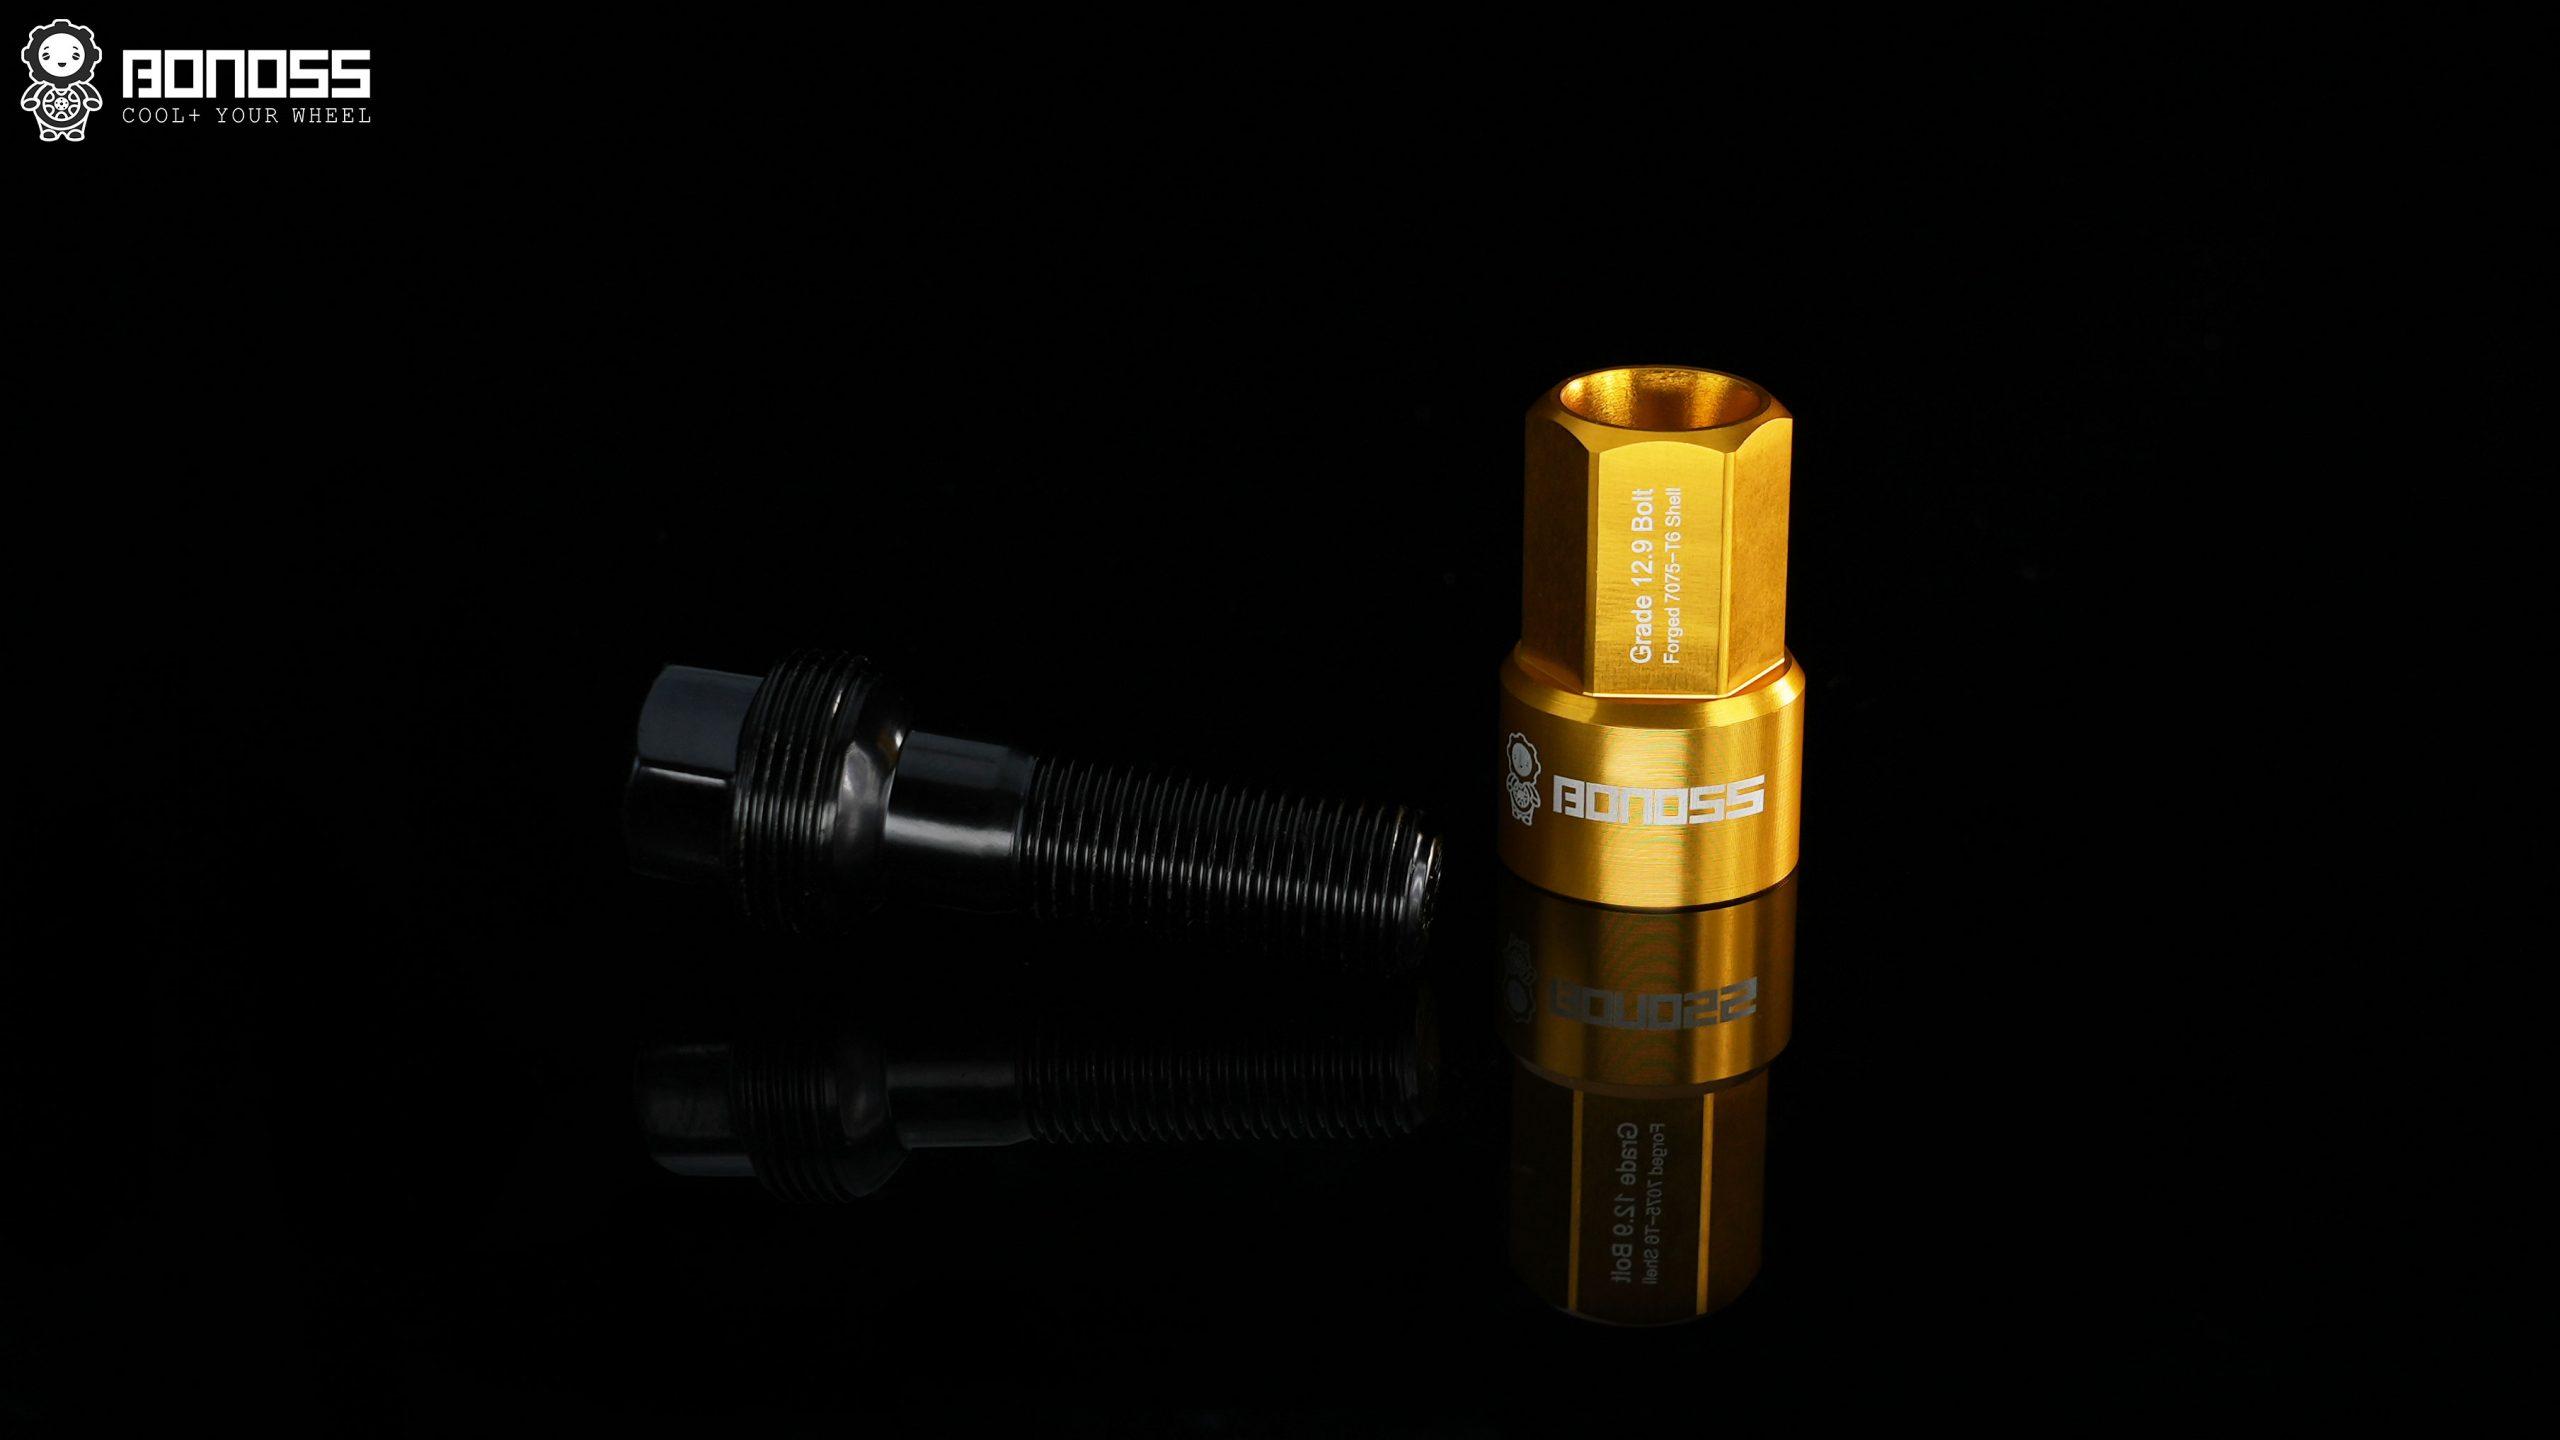 BONOSS Forged 7075-T6 shell type lock bolt kit